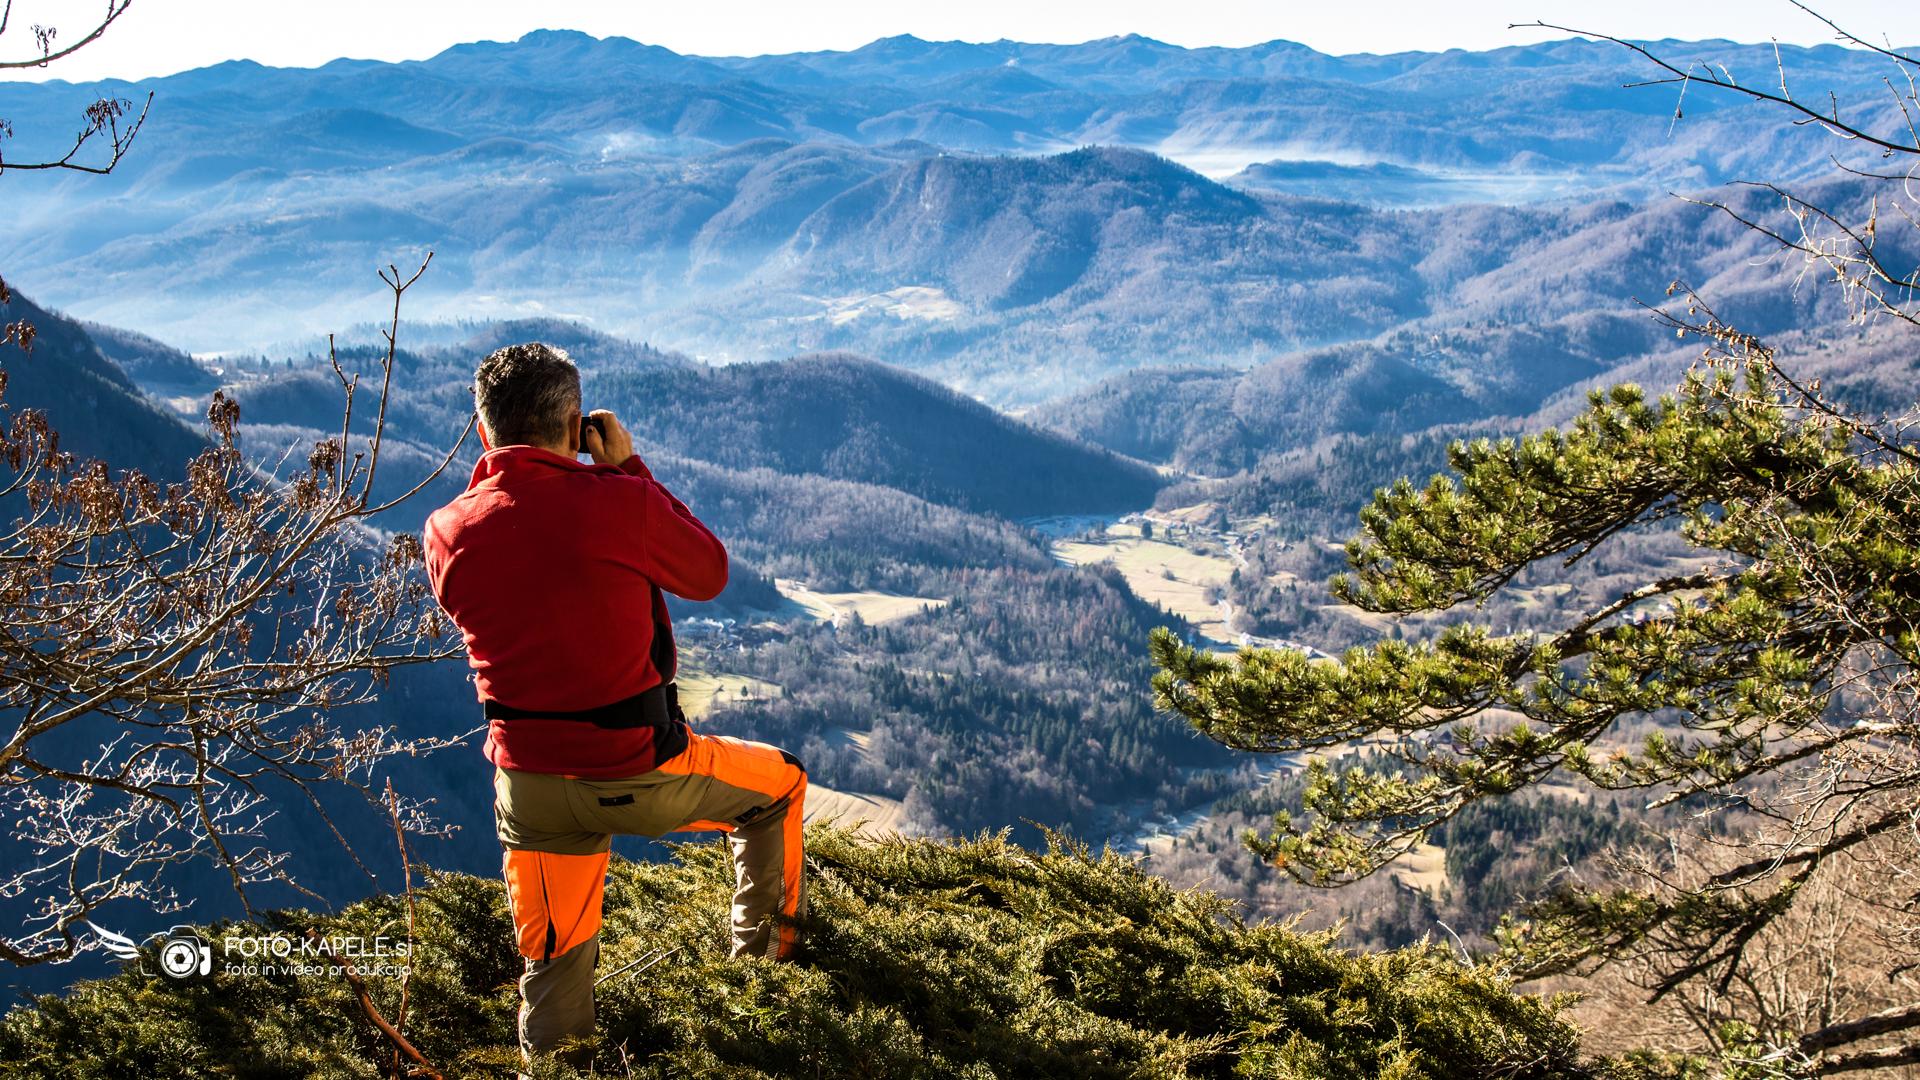 Komercialno fotografiranje za turizem, pohodništvo, rekreacija, narava